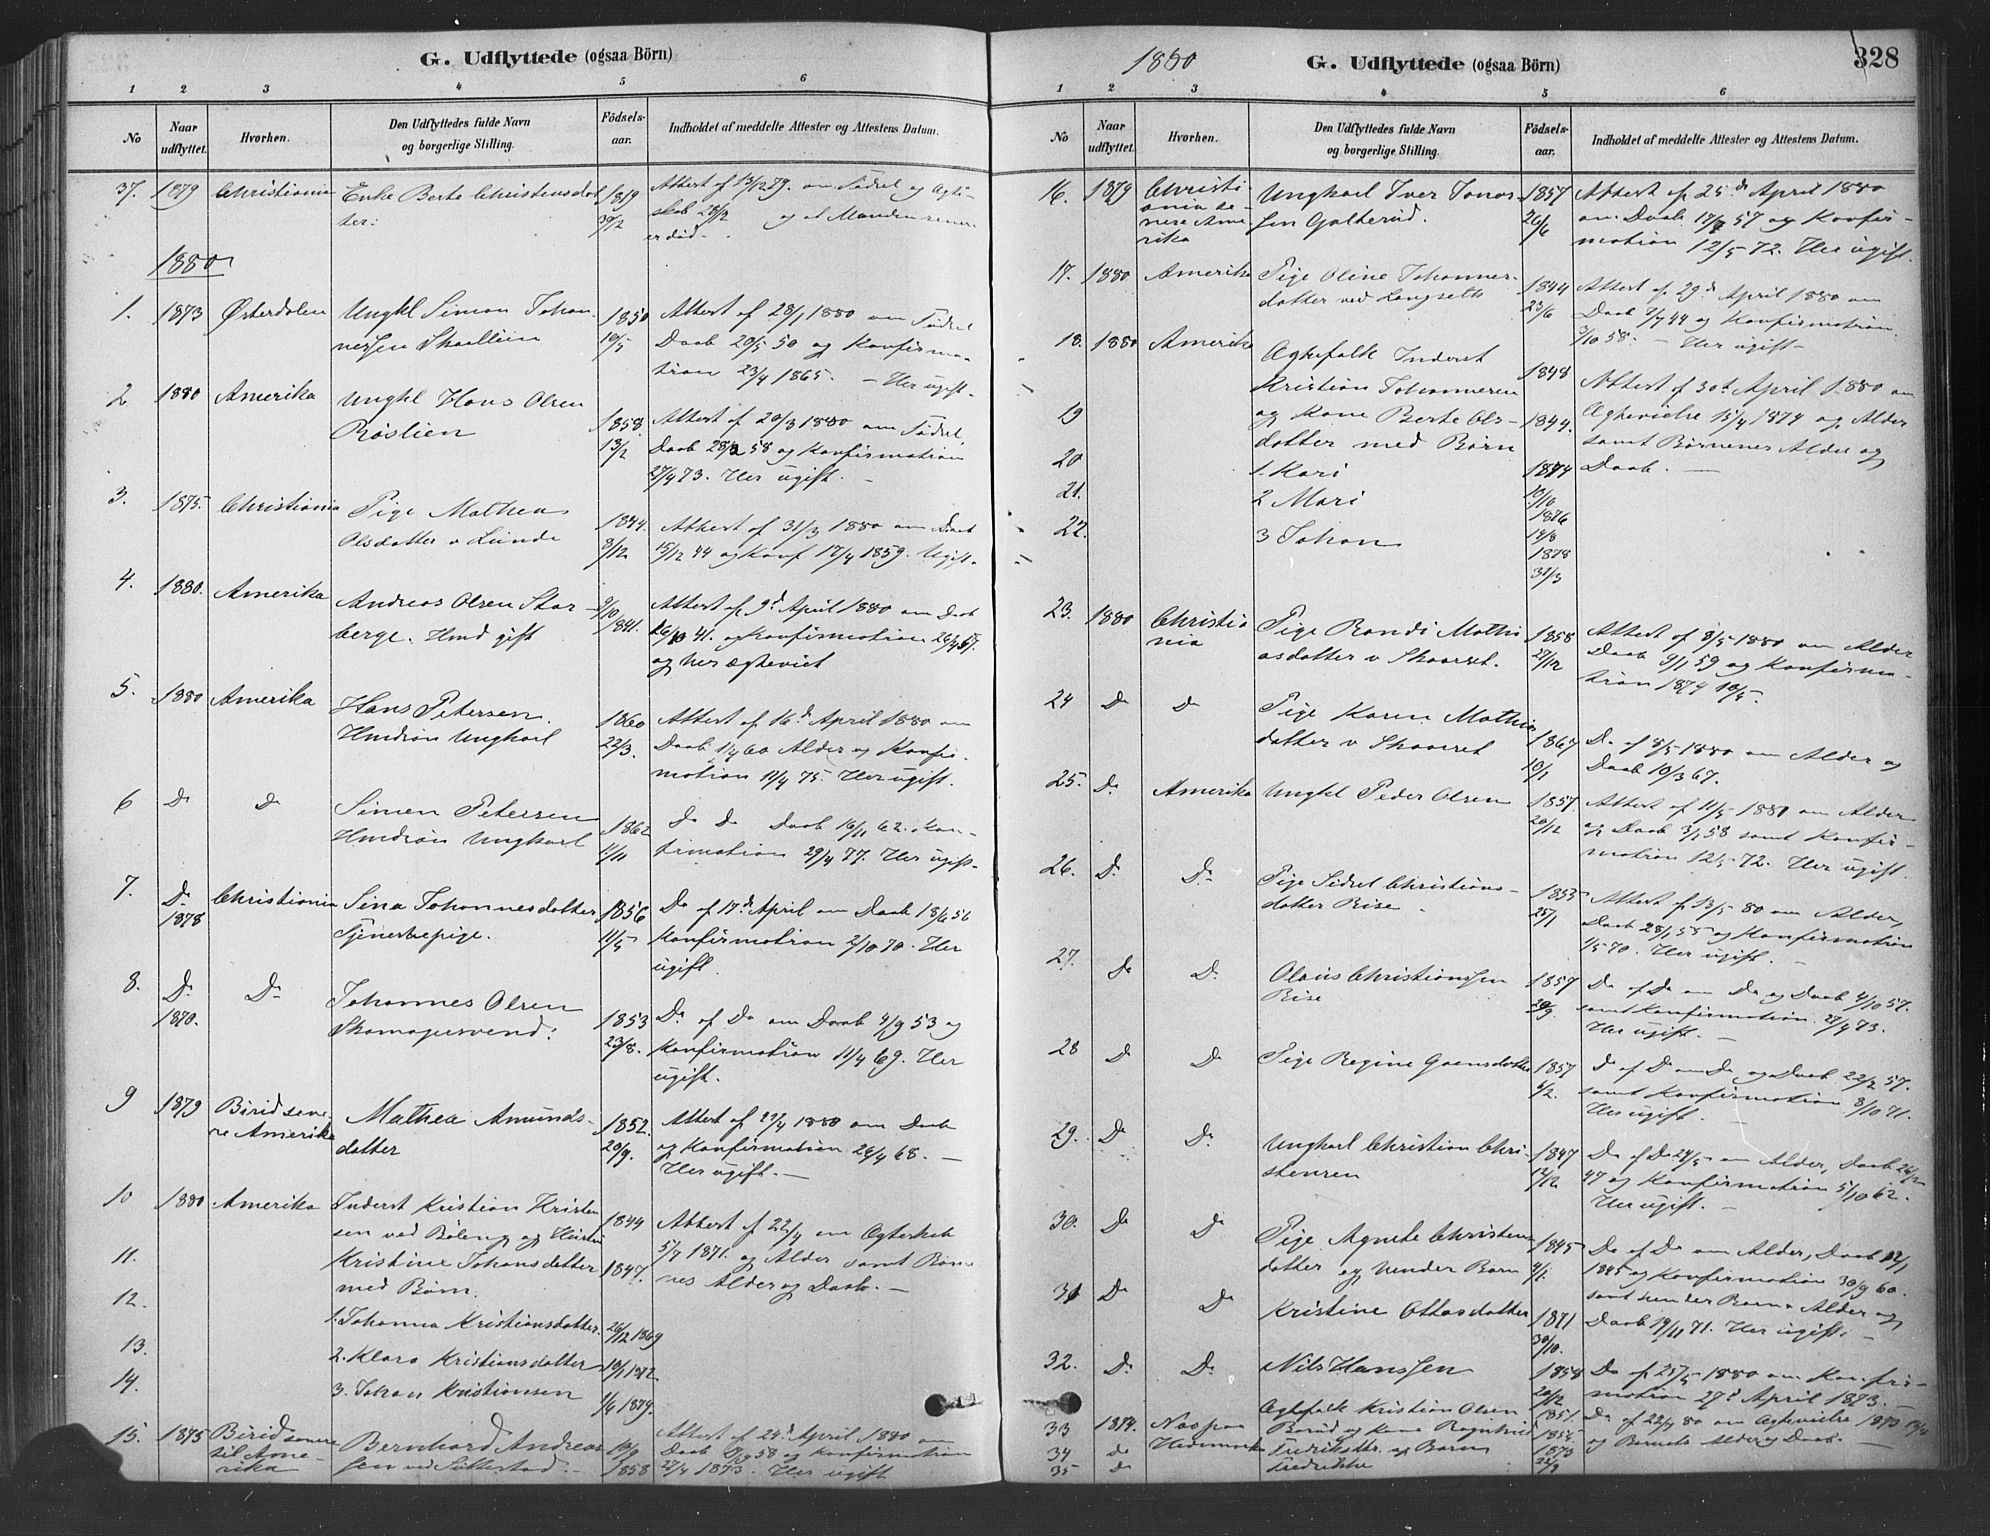 SAH, Fåberg prestekontor, Ministerialbok nr. 9, 1879-1898, s. 328